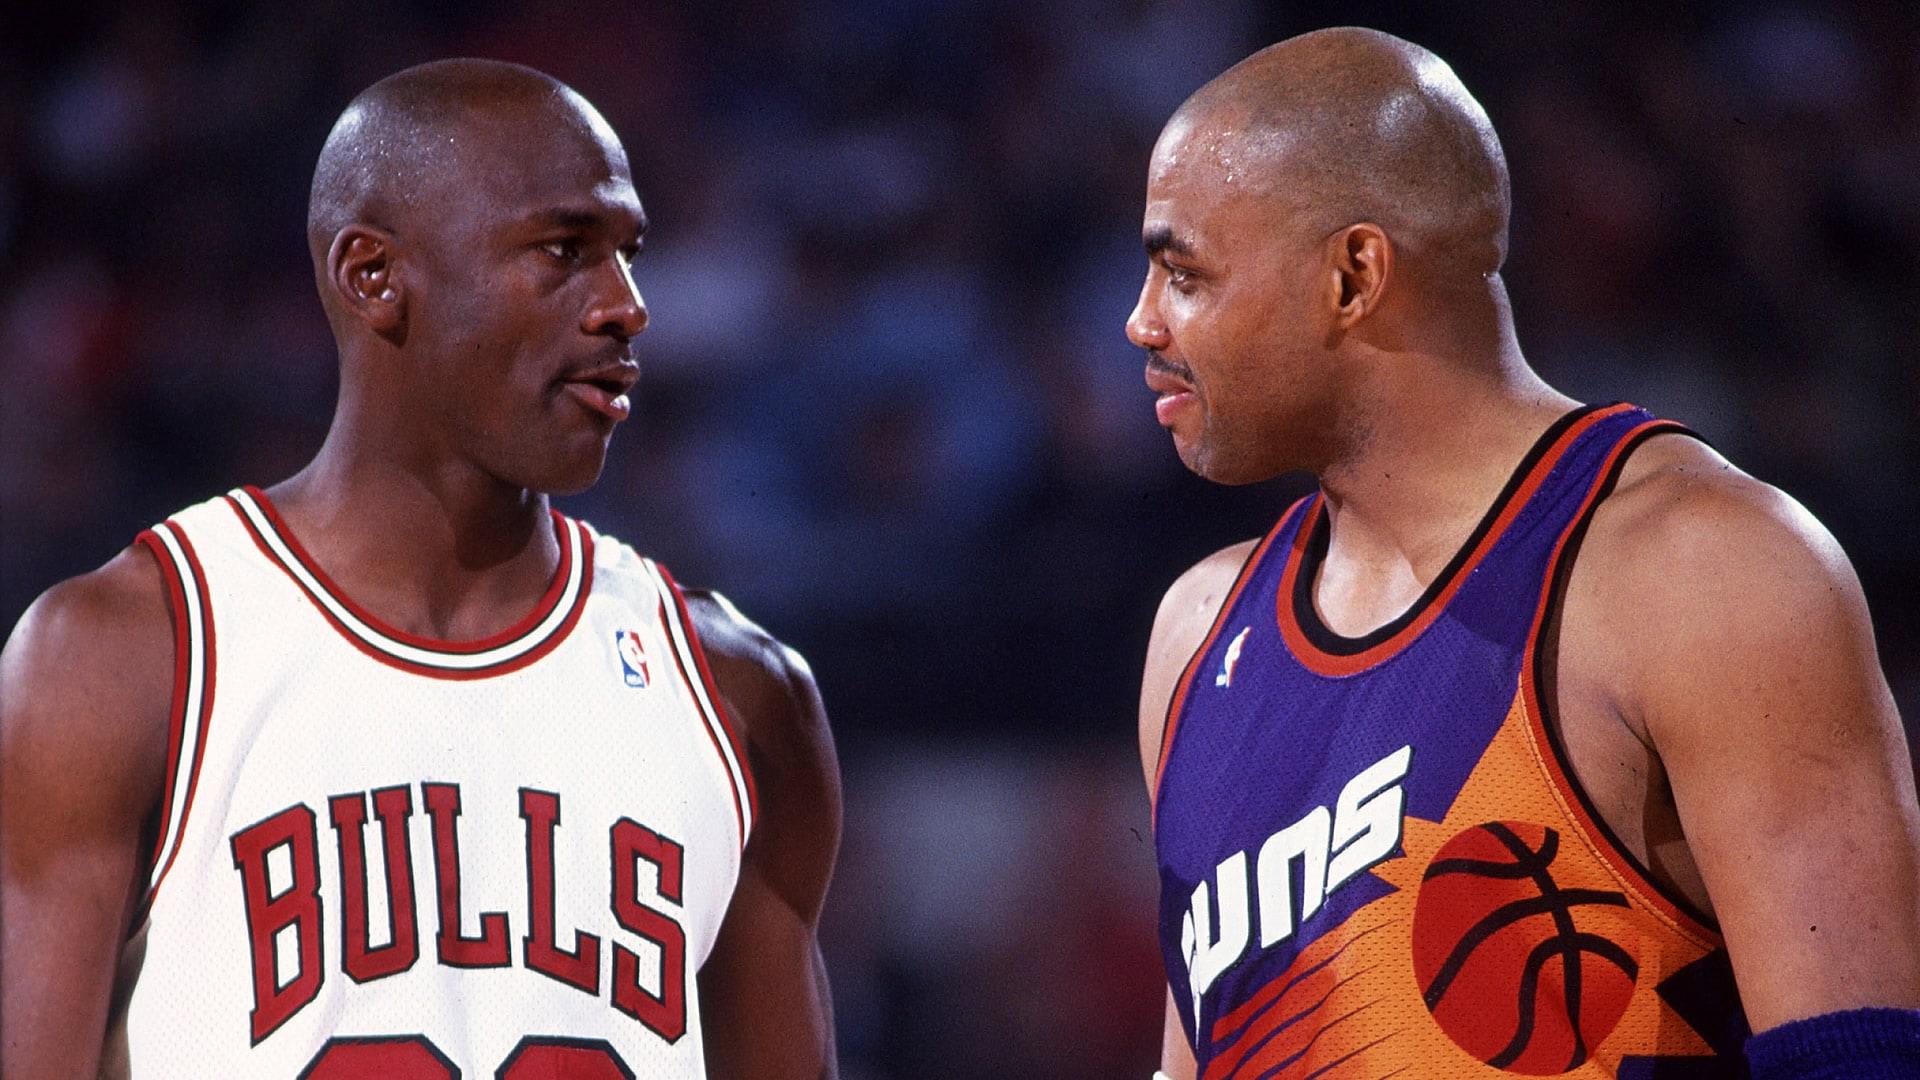 Charles Barkley says Michael Jordan once bet $300,000 on single ...